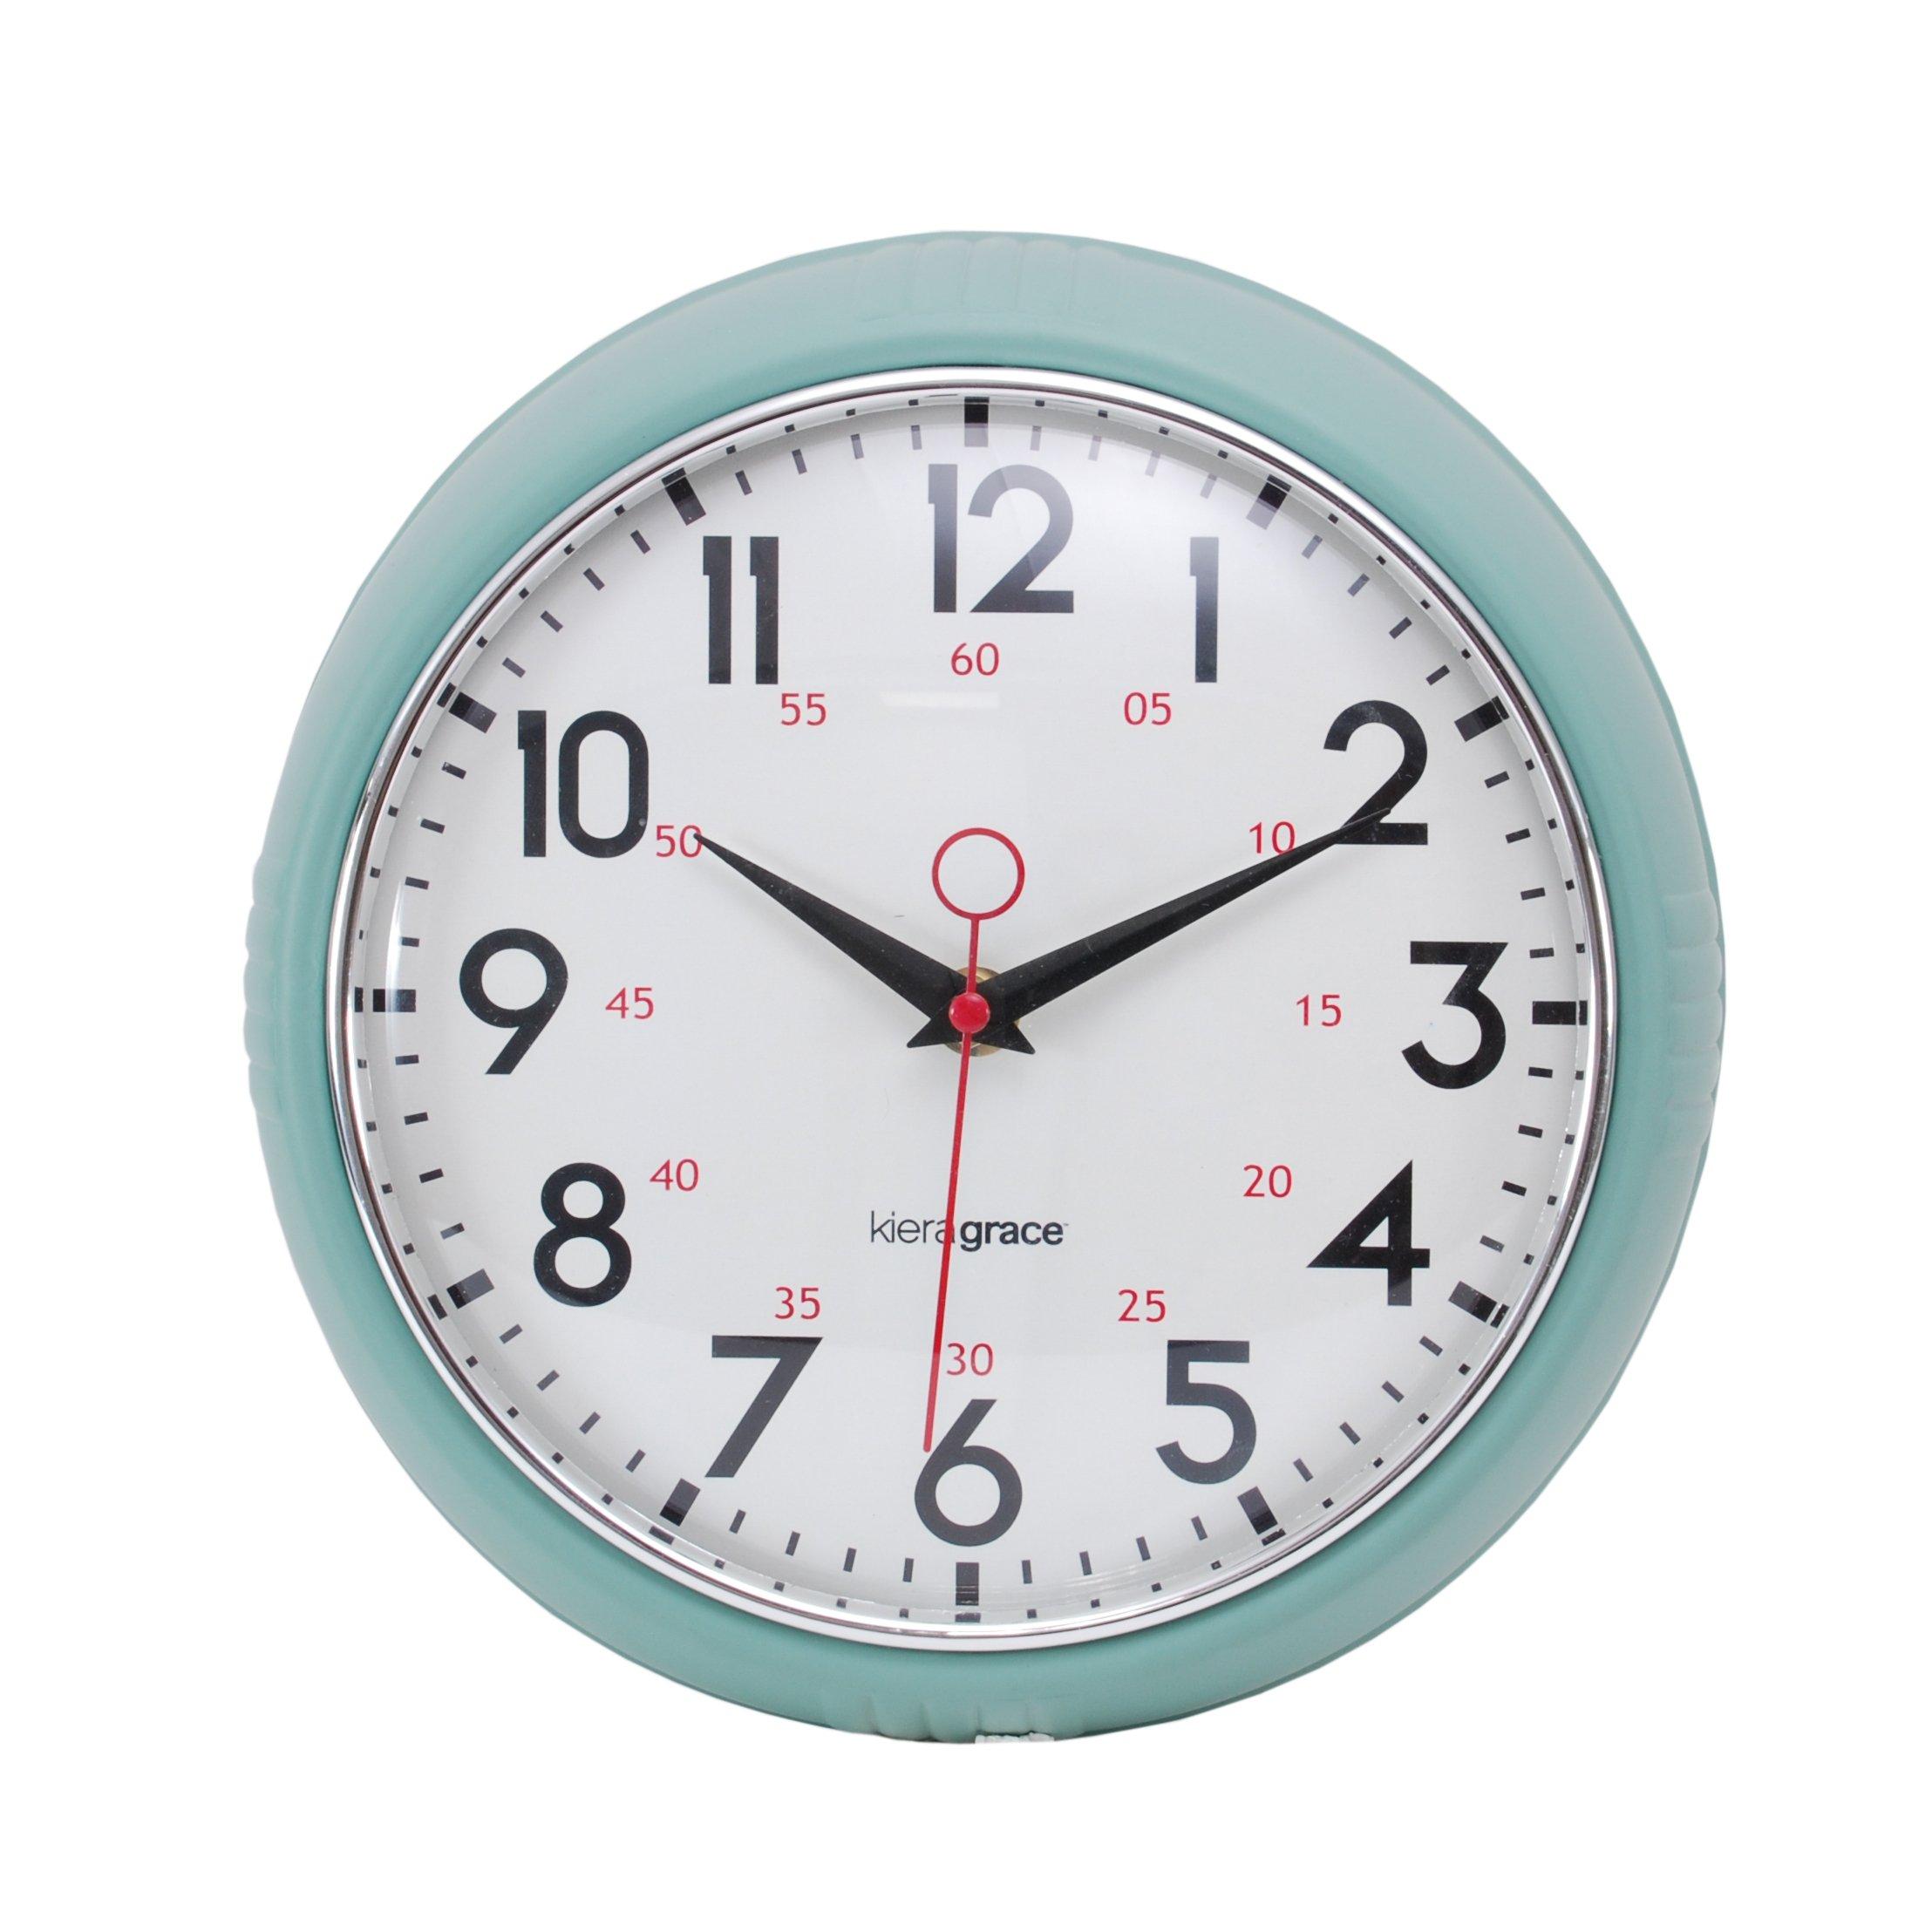 Kiera Grace Retro Wall Clock with Chrome Bezel and Convex Glass Lens, 9.5-Inch, 2.5-Inch Deep, Green by Kiera Grace